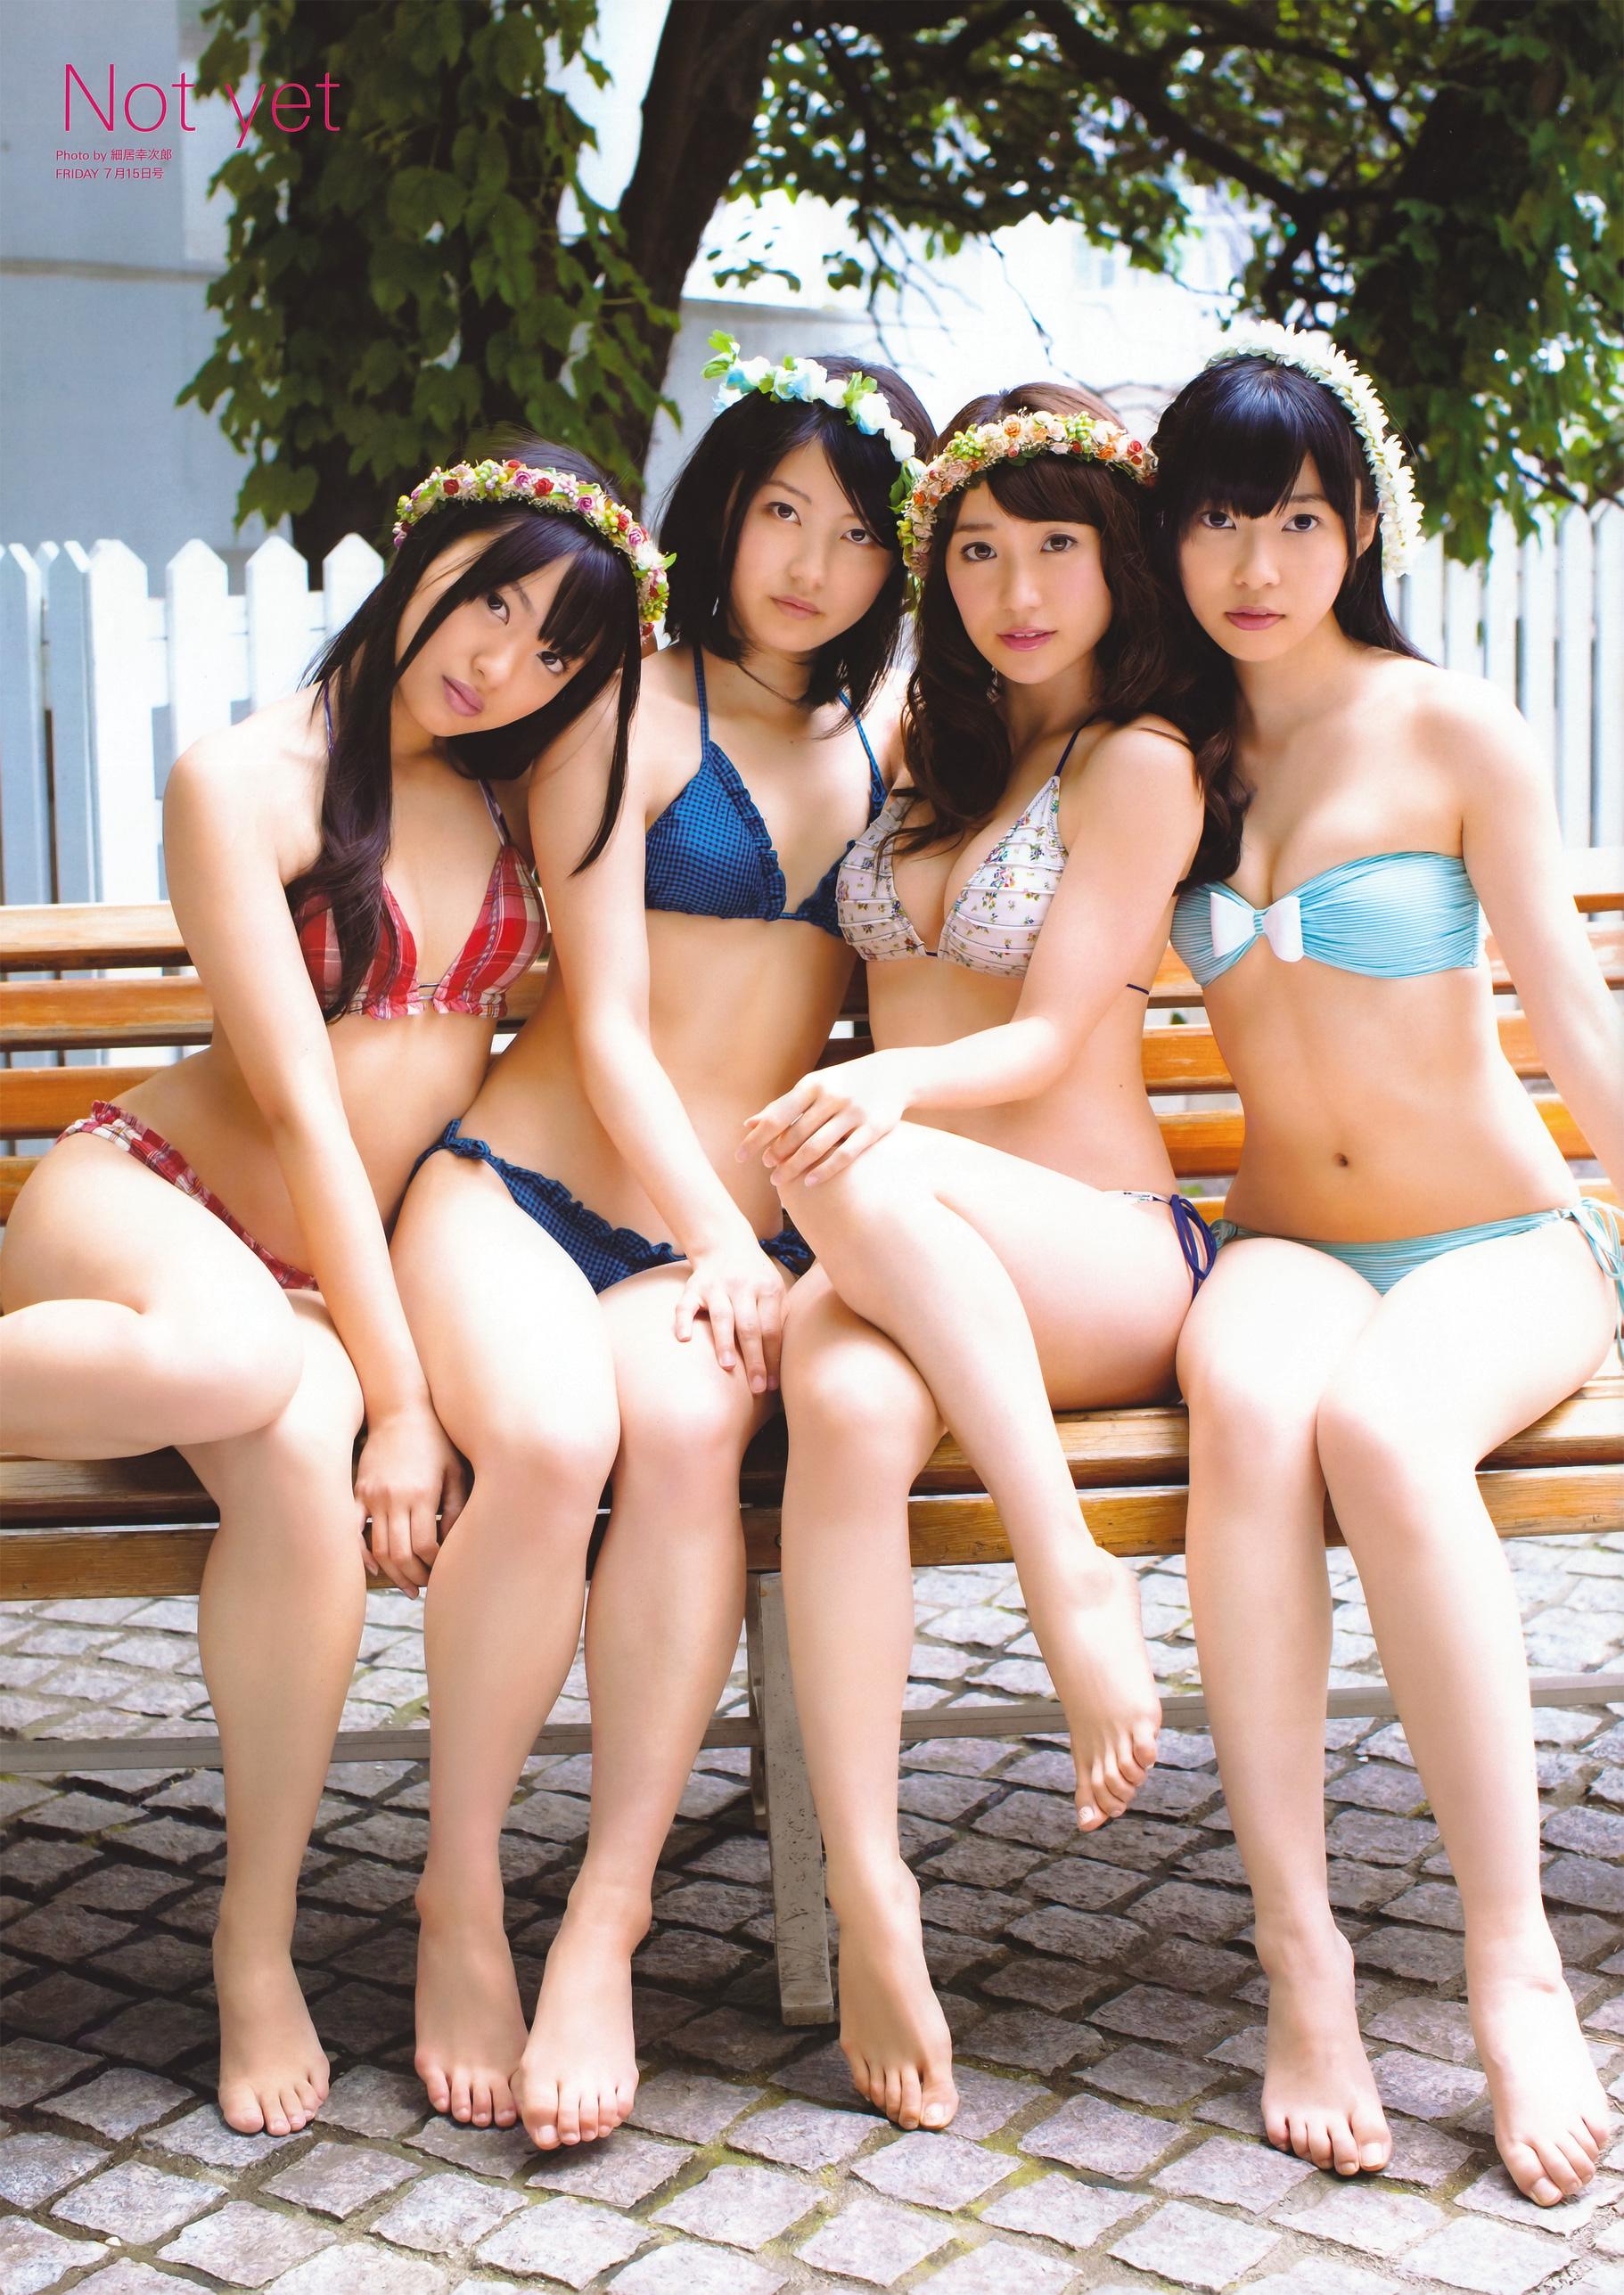 http://pics.wikifeet.com/Yui-Yokoyama-Feet-862942.jpg